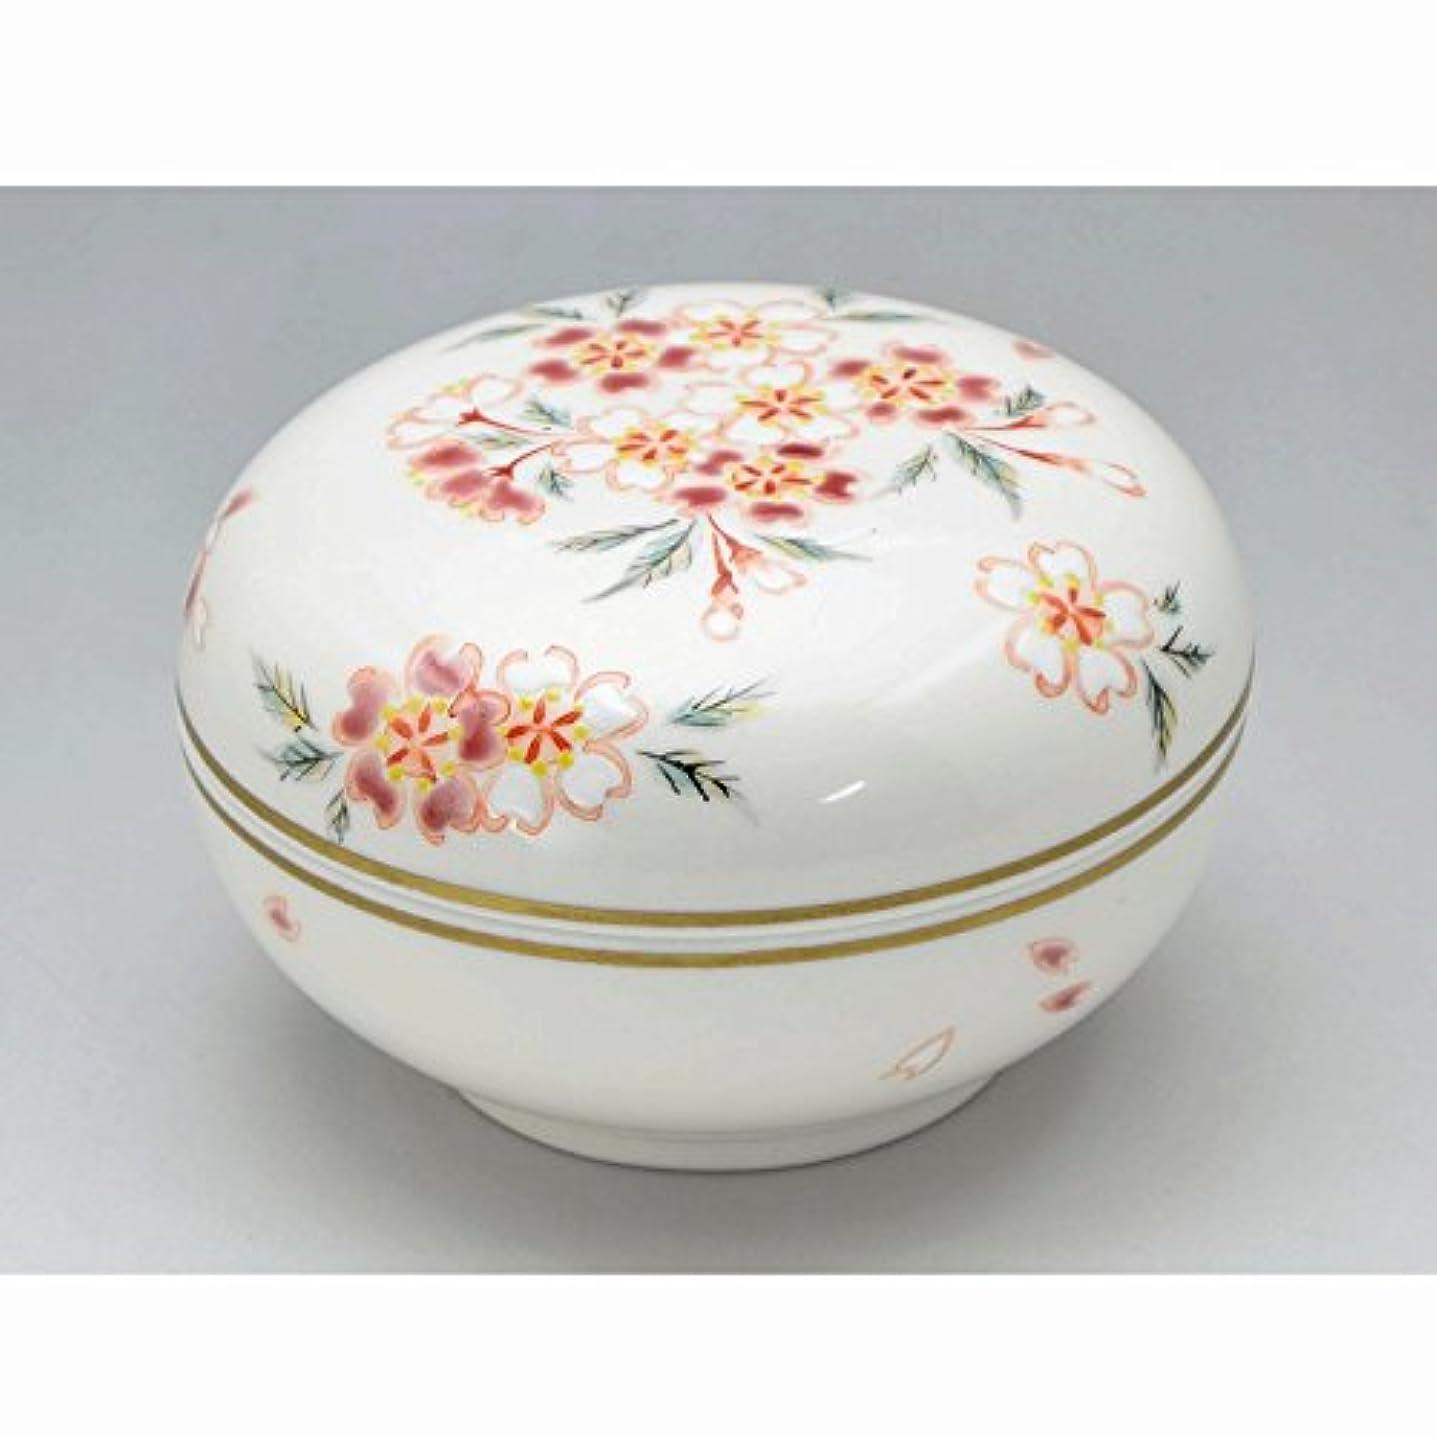 アルネ出撃者旧正月京焼?清水焼 磁器 香合 花桜 紙箱入 Kiyomizu-kyo yaki ware. Japanese porcelain kogo incense burner hanazakura with paper box.